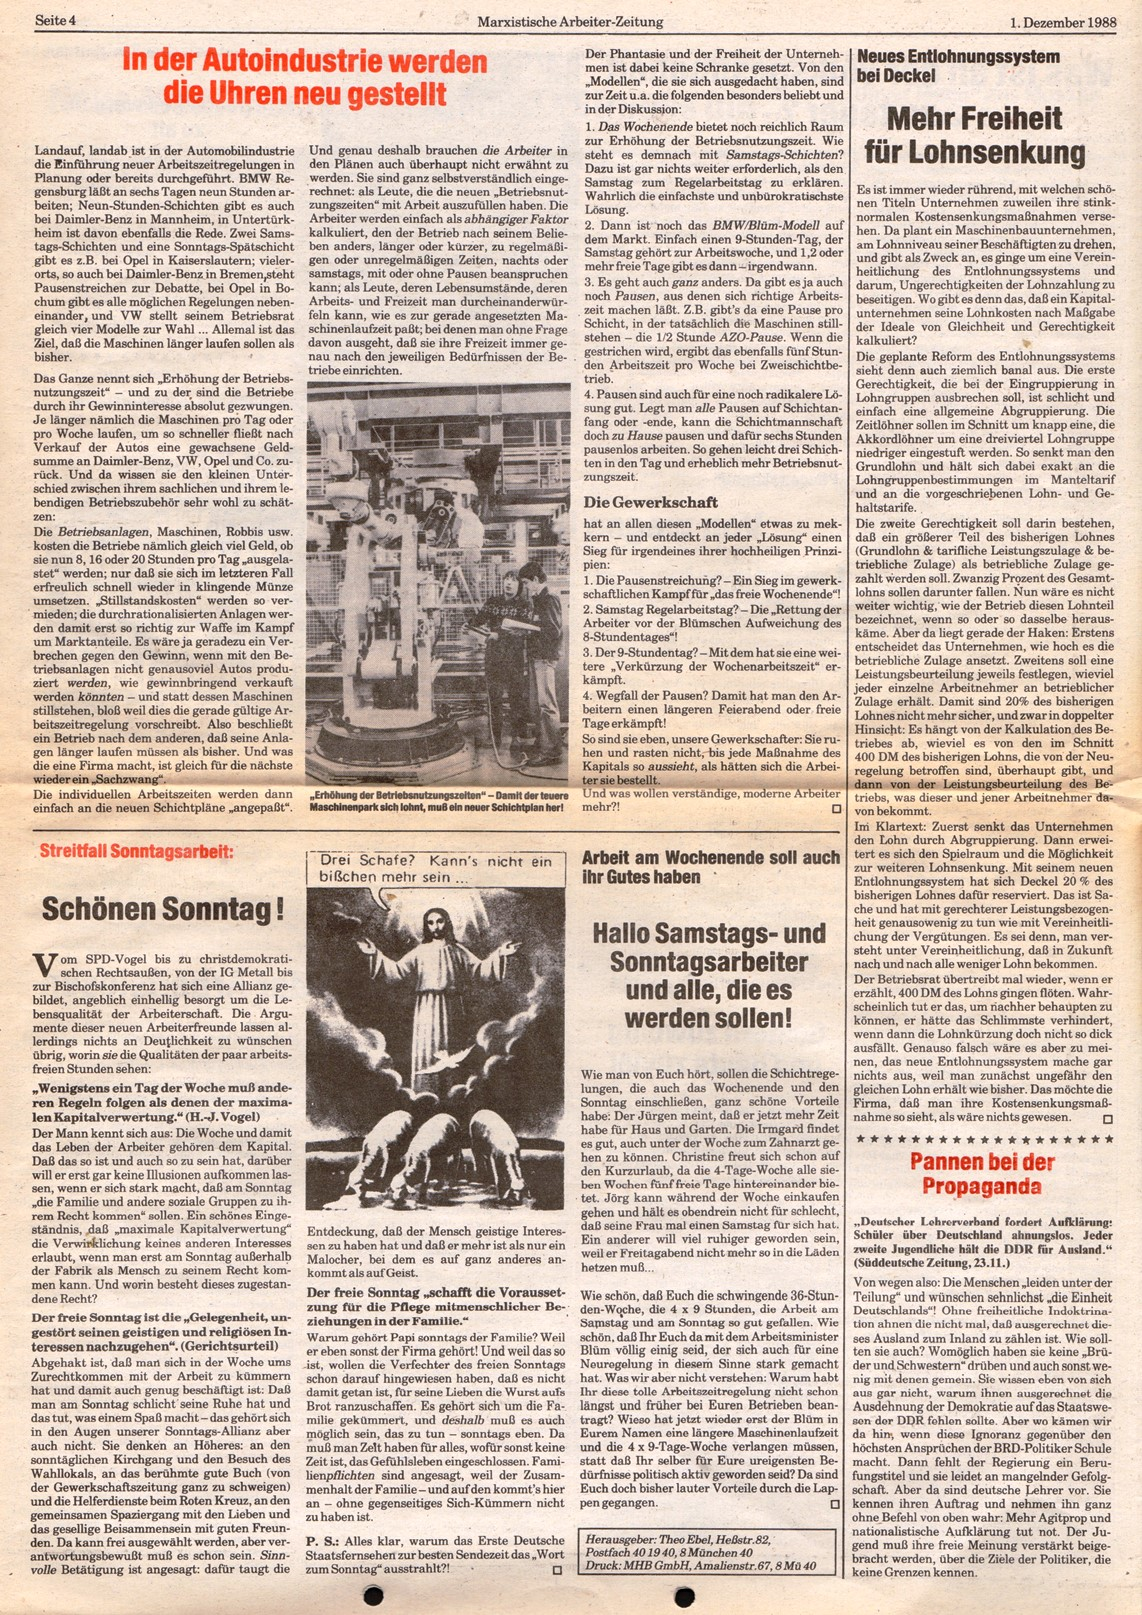 Muenchen_MG_MAZ_19881201_04